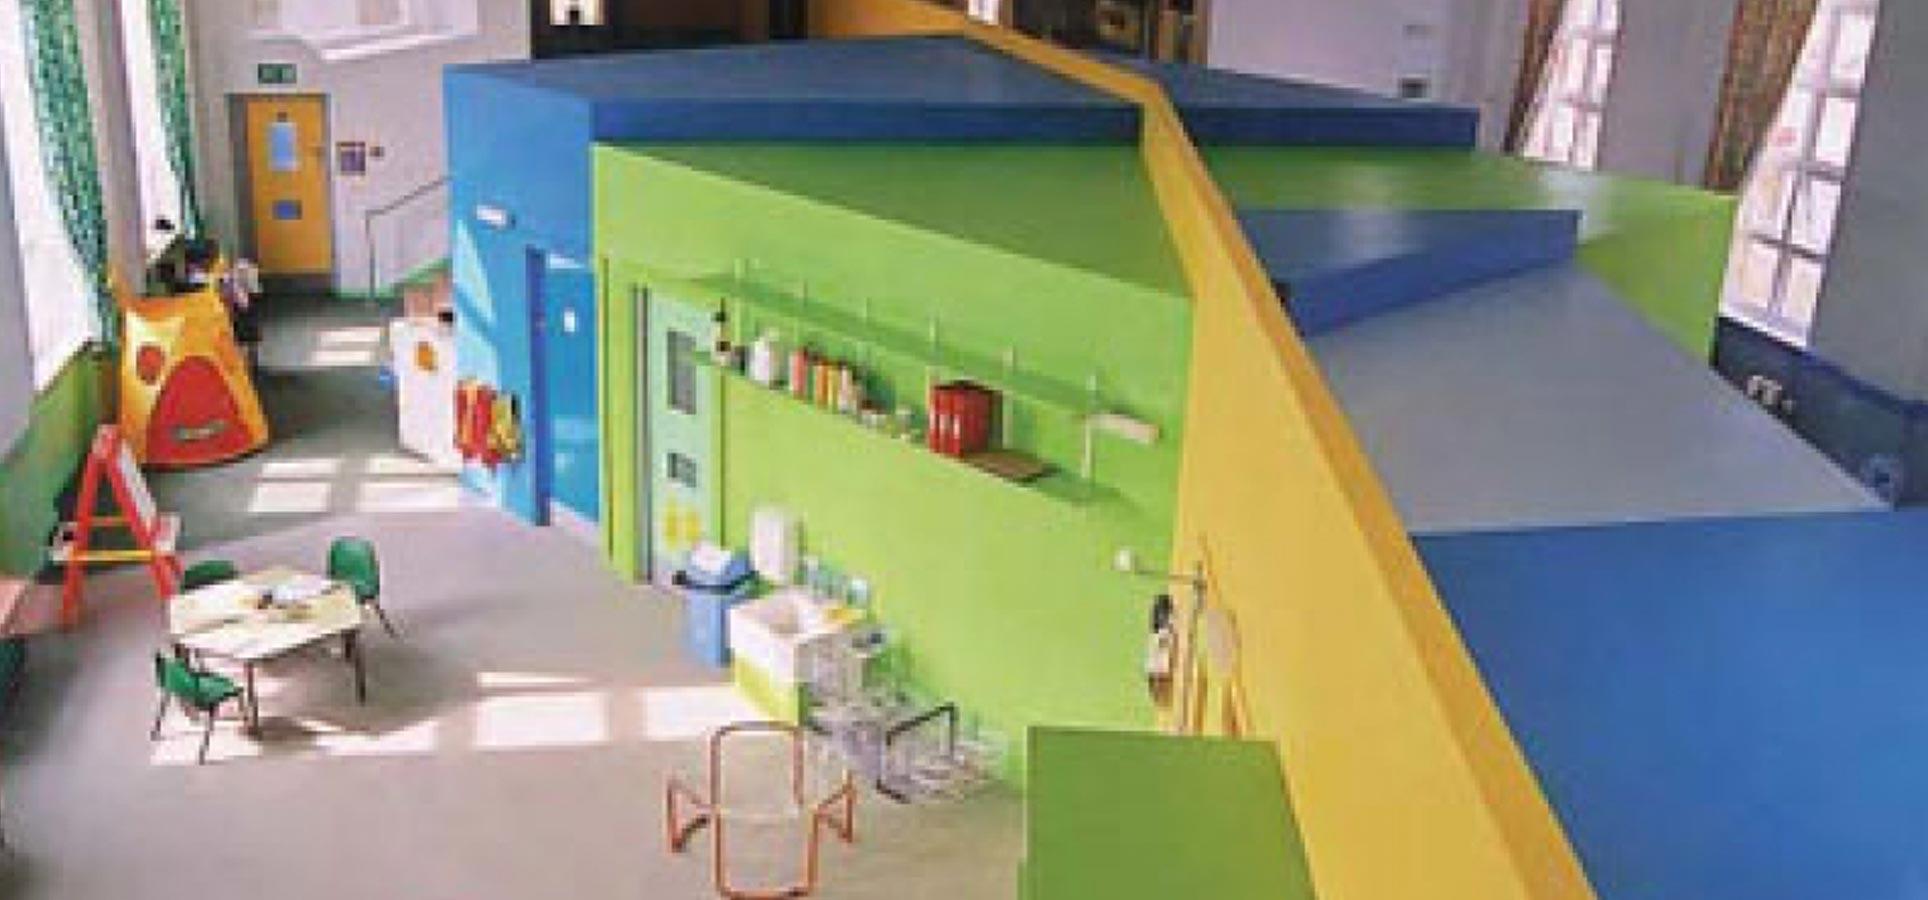 Leapfrog Day Nursery, Jessops Construction Ltd